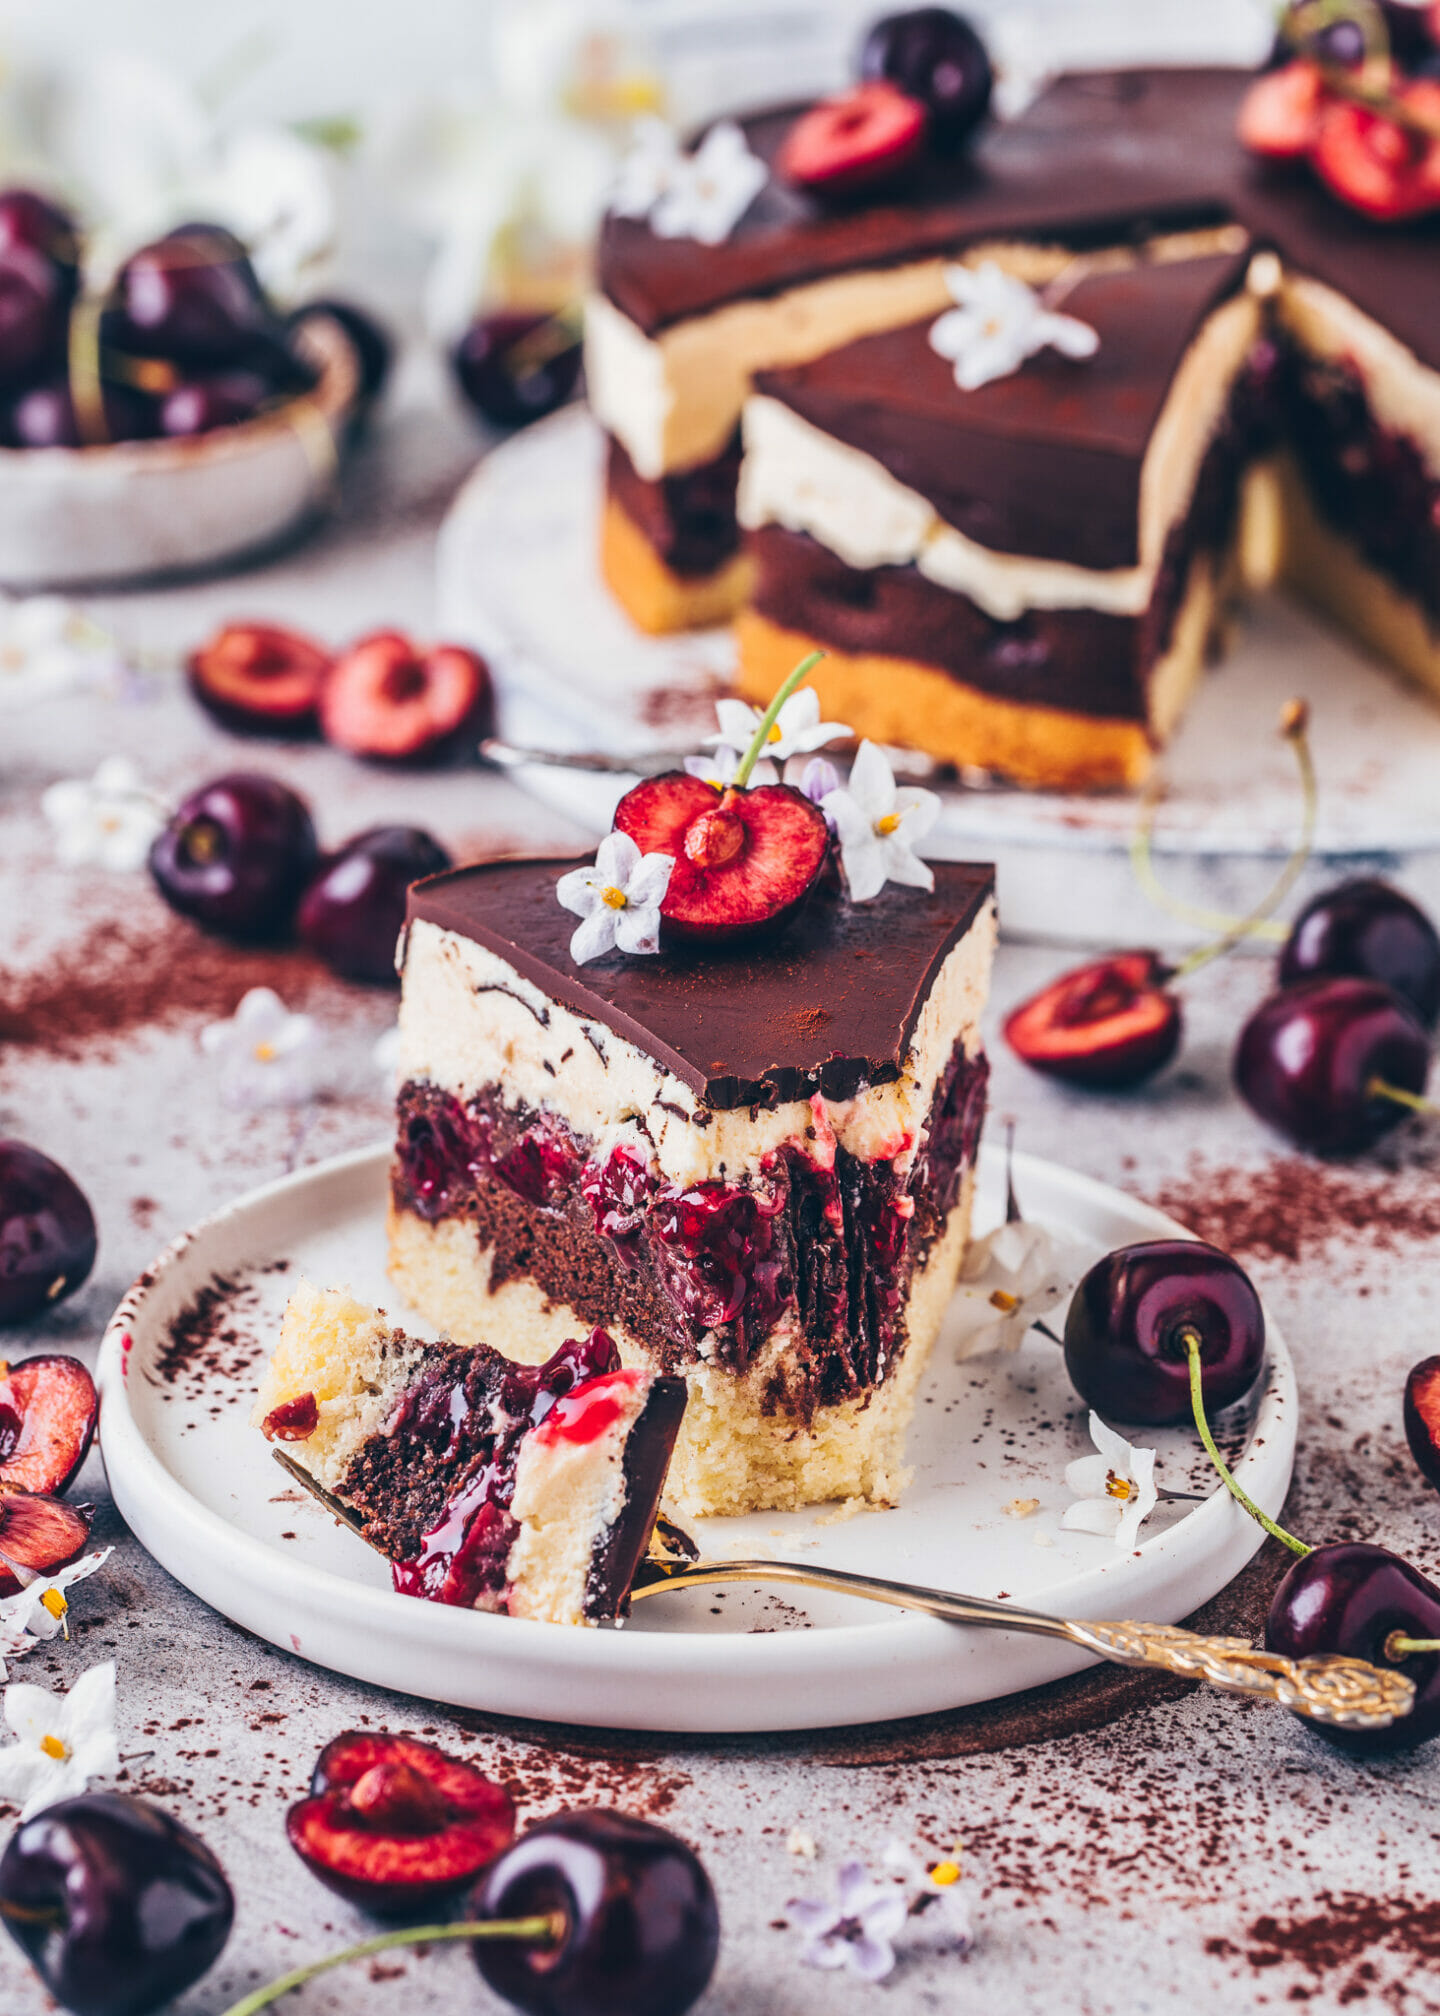 German Danube Wave (Cherry Chocolate Cake)